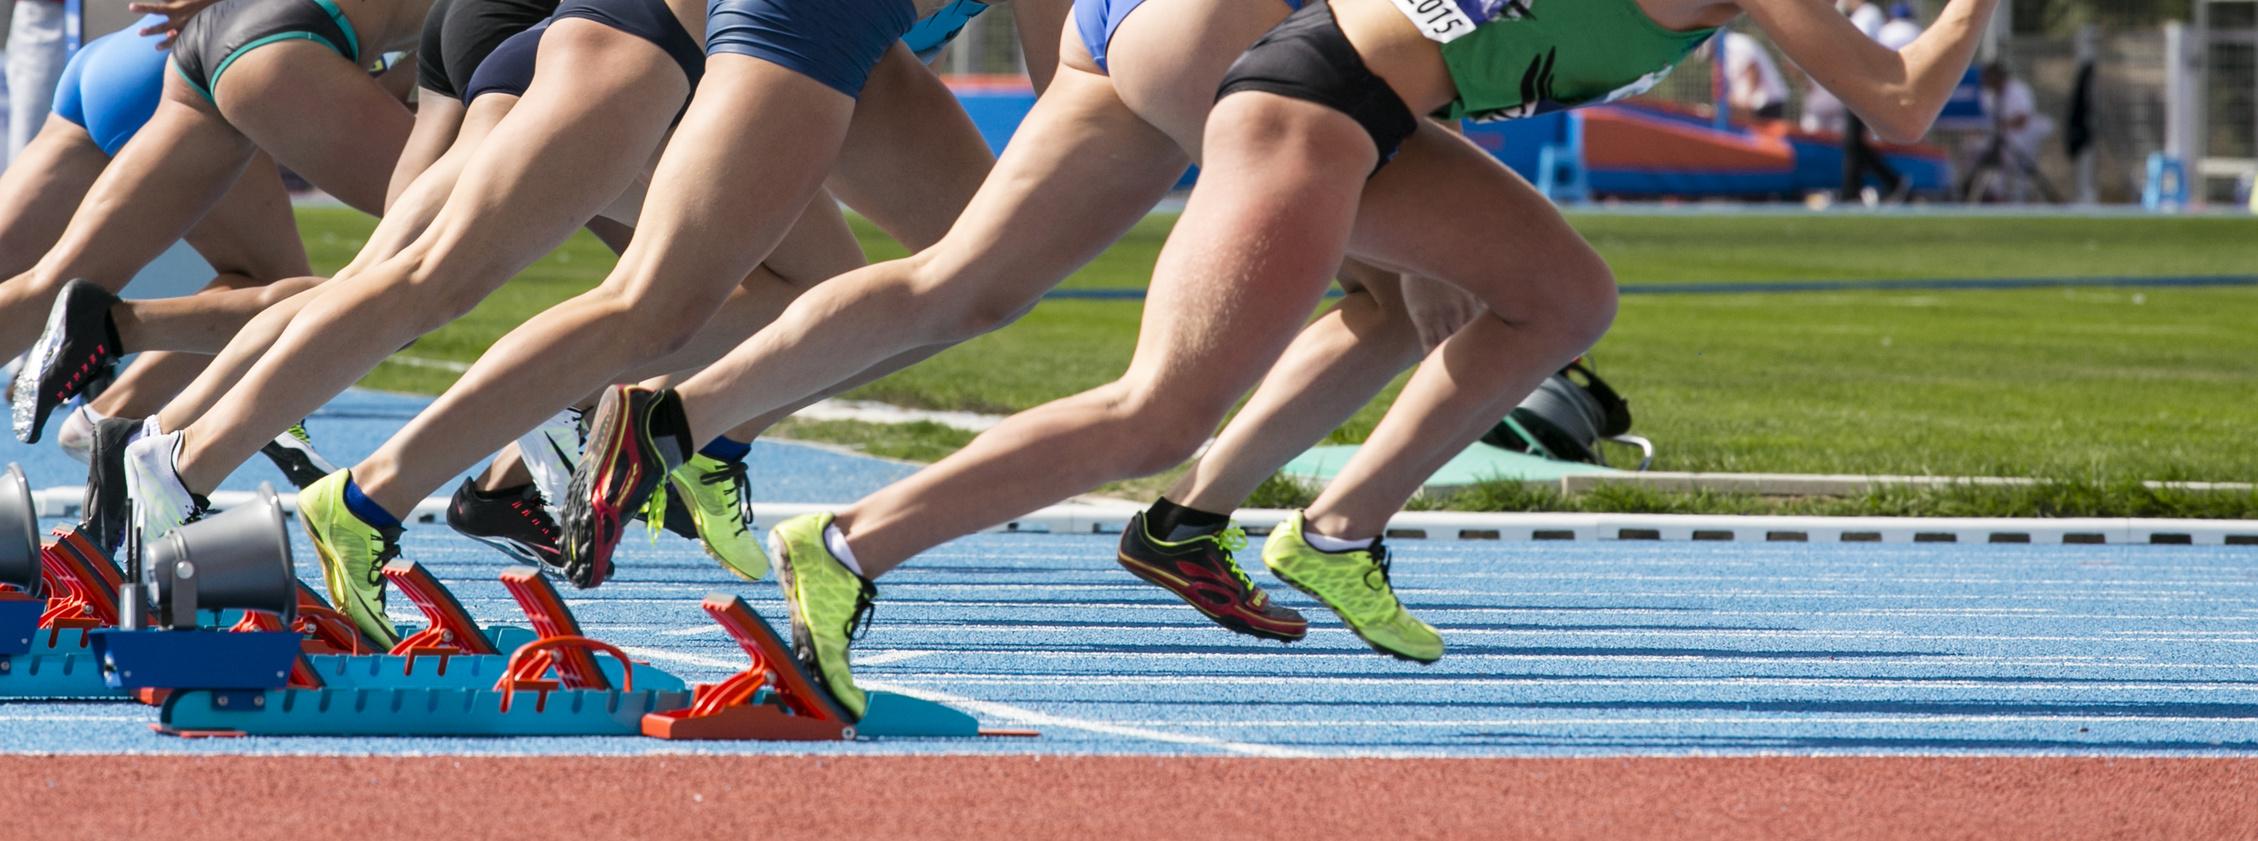 Sportpsychologie & Mentaltraining